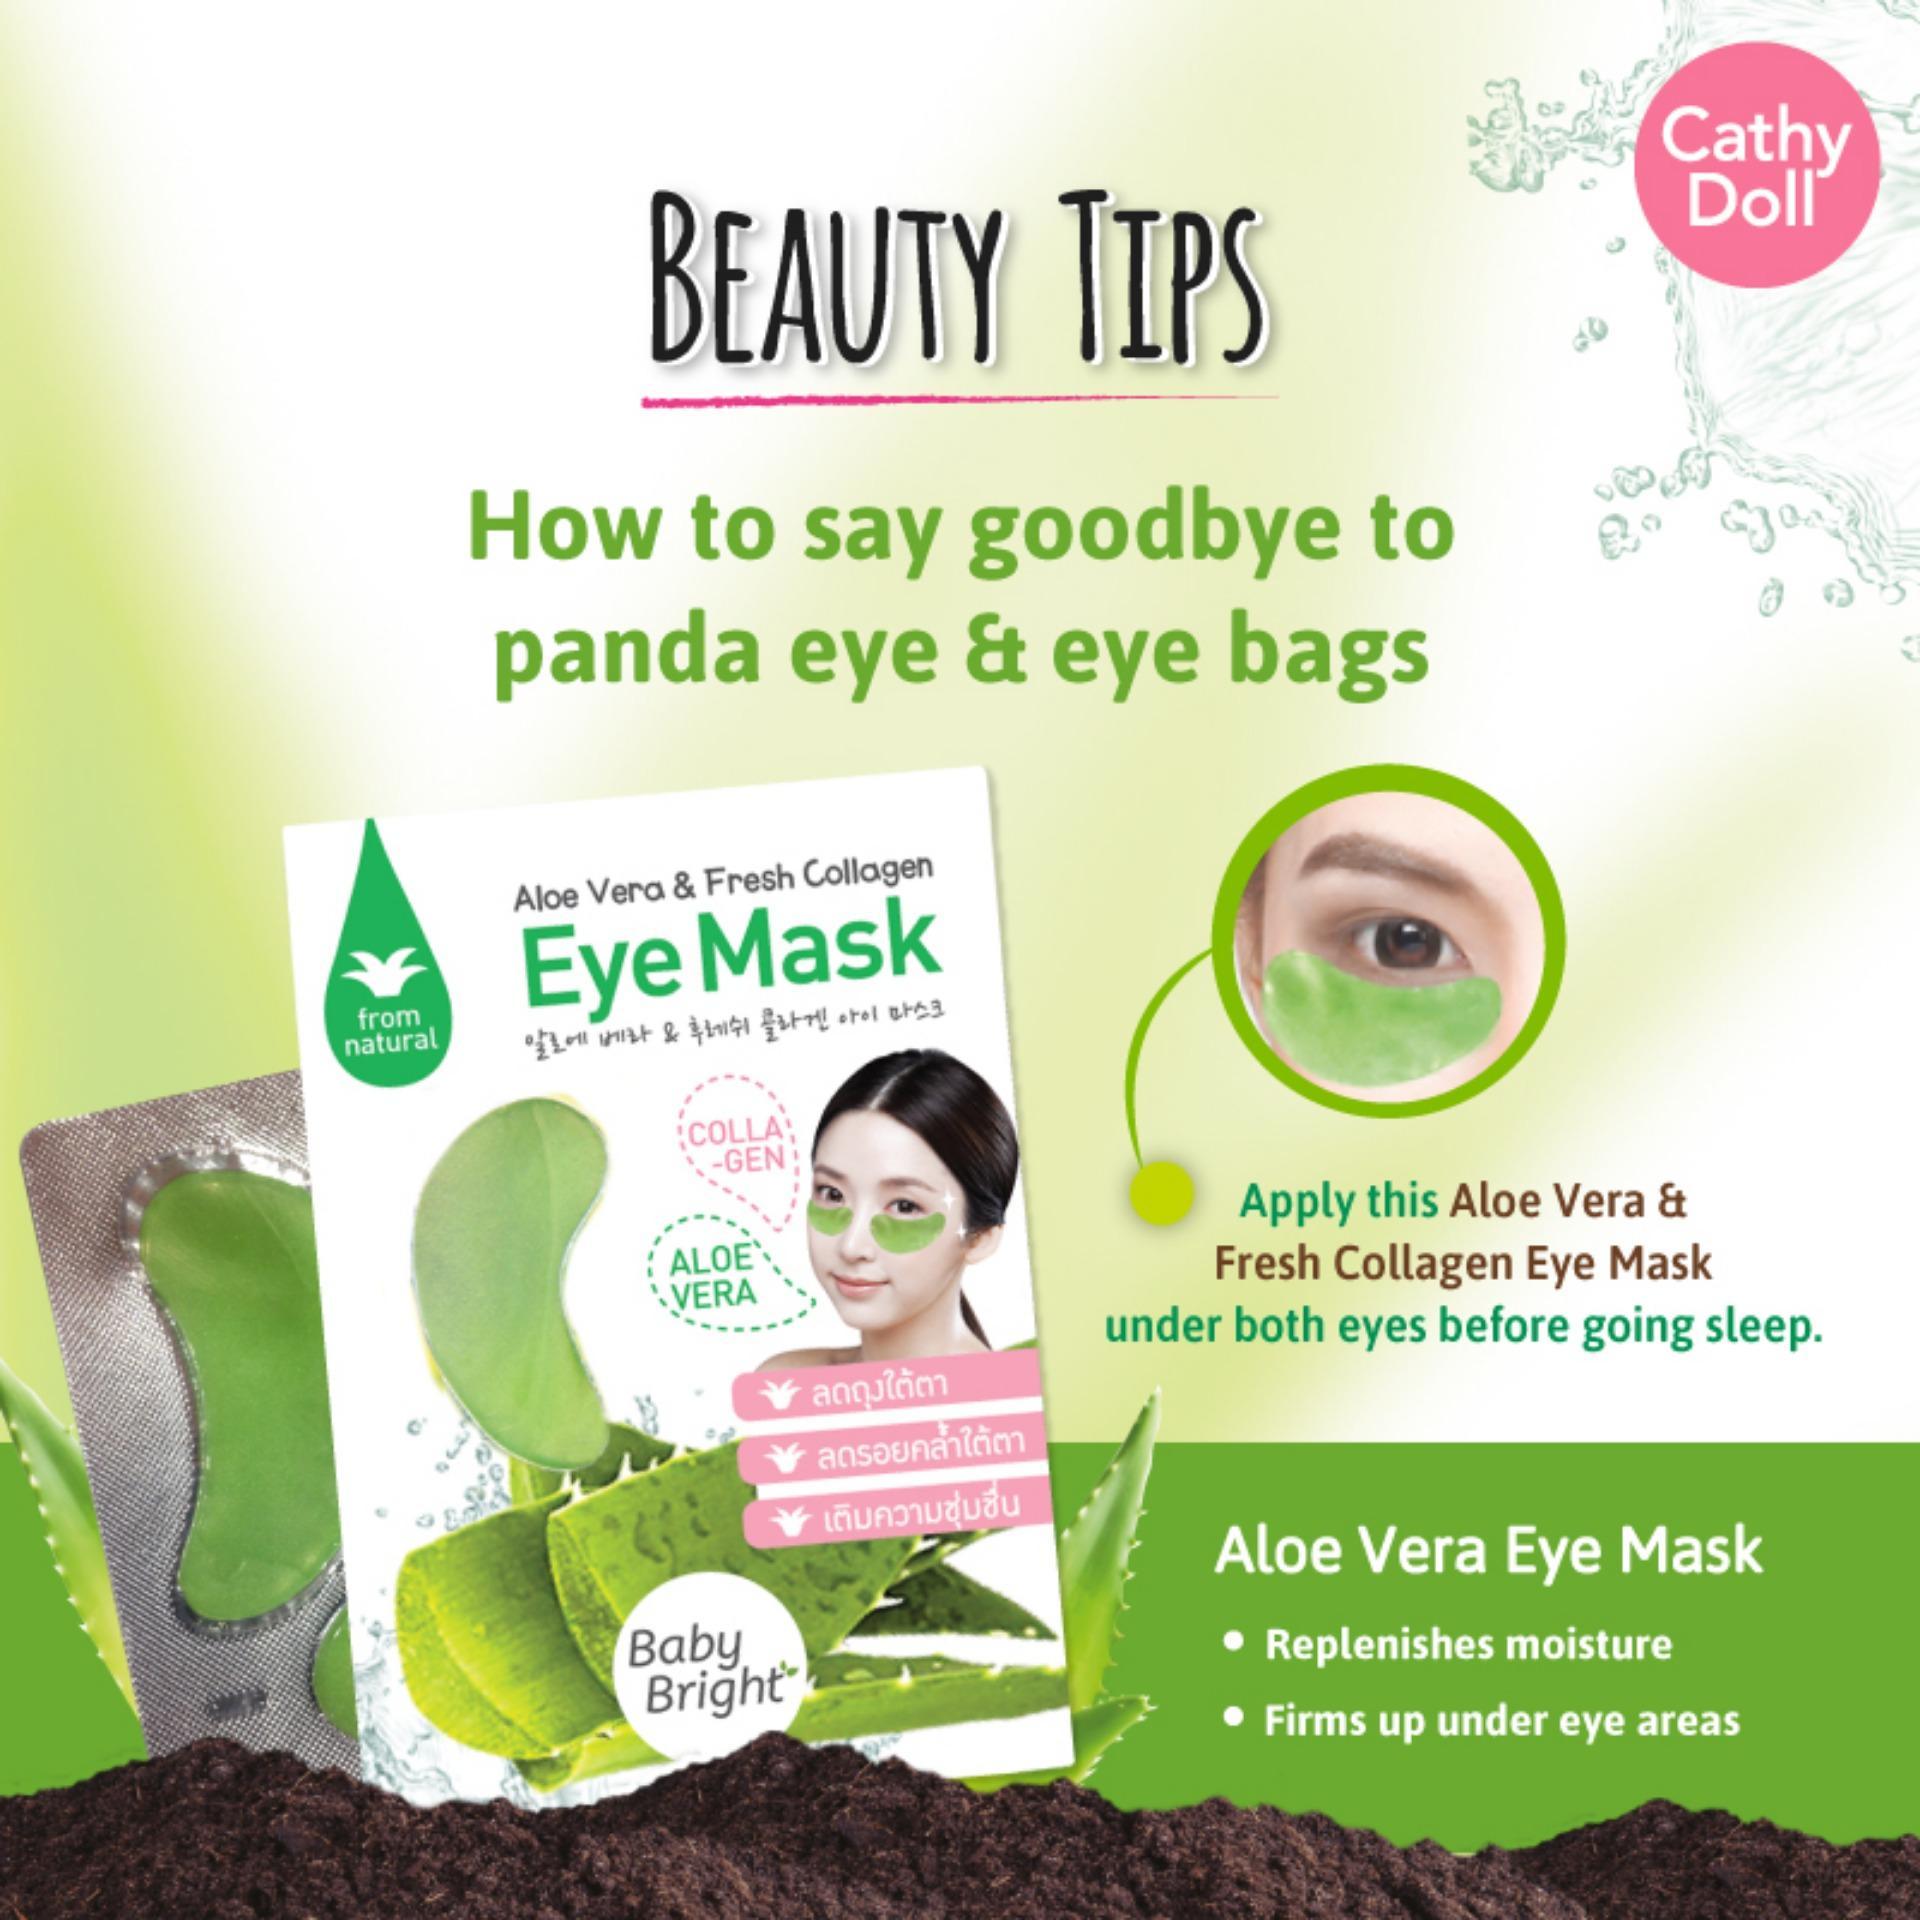 Kehebatan Baby Bright Aloe Vera Eye Mask Dan Harga Update Bio Aqua Masker Wajah Jaman Now Gambar Produk Lengkap